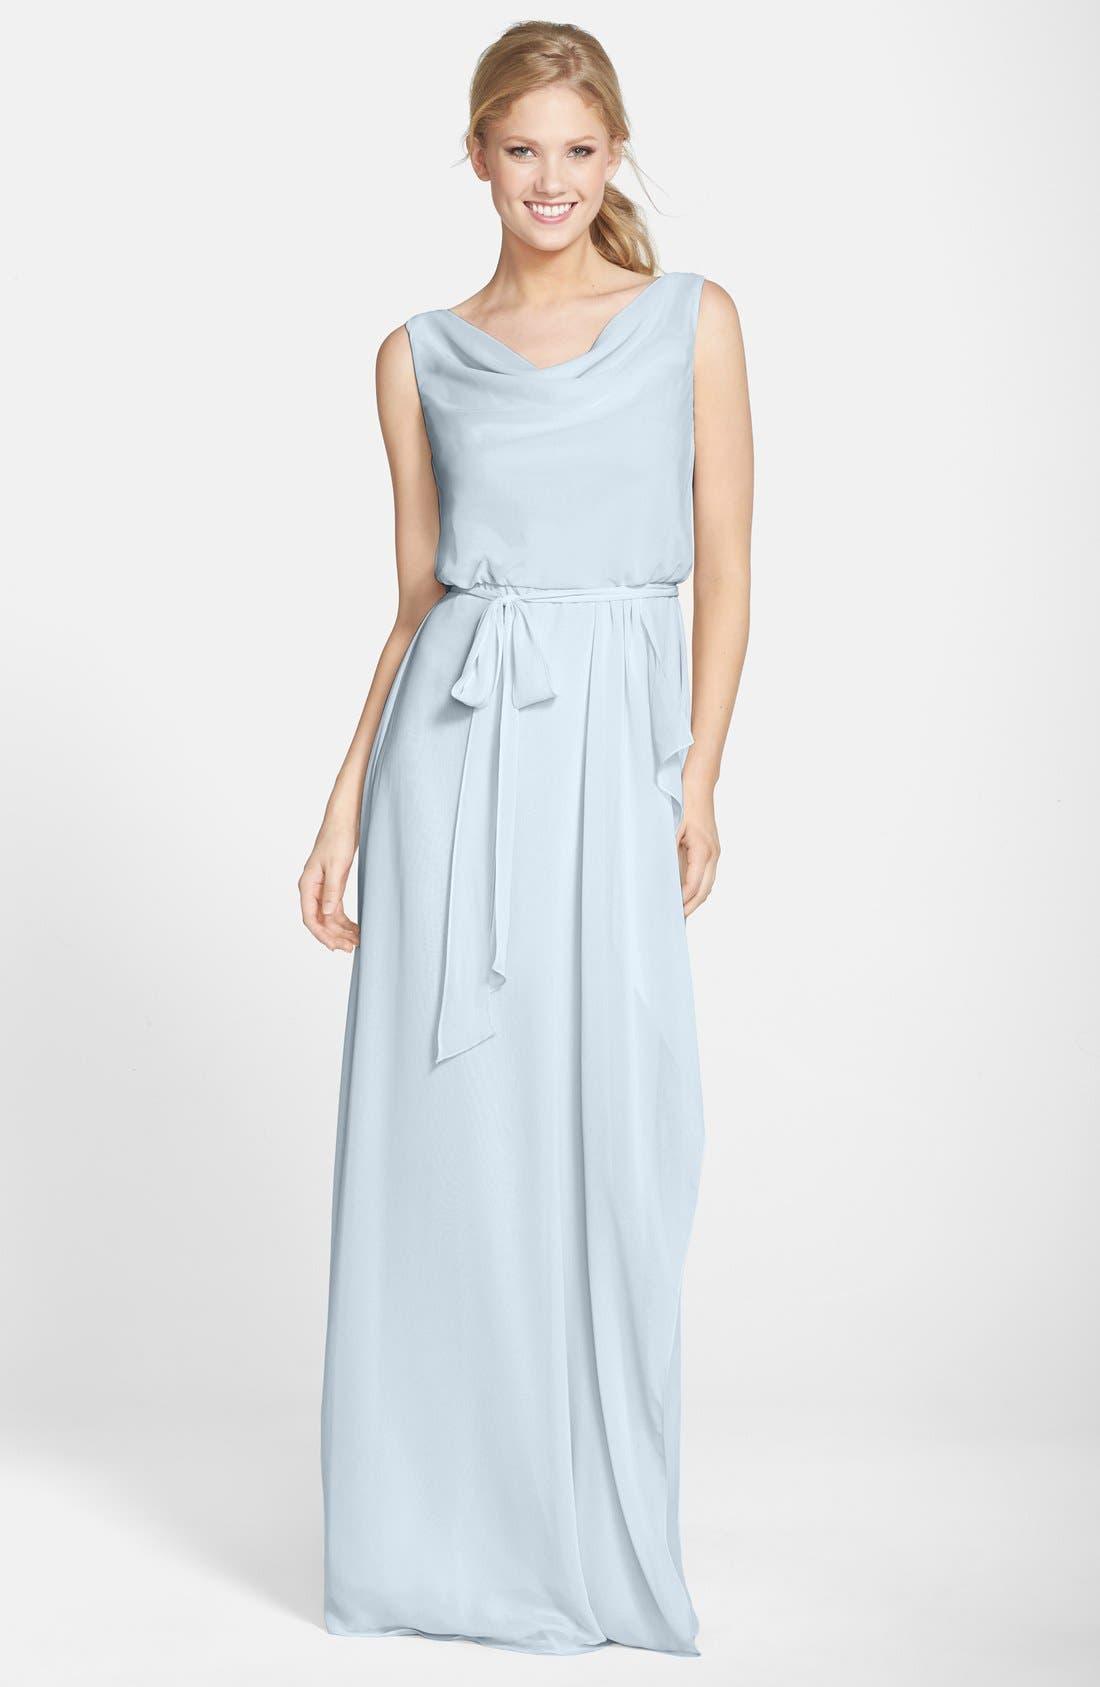 nouvelle AMSALE 'Kim' Drape Neck Wrap Skirt Chiffon Gown